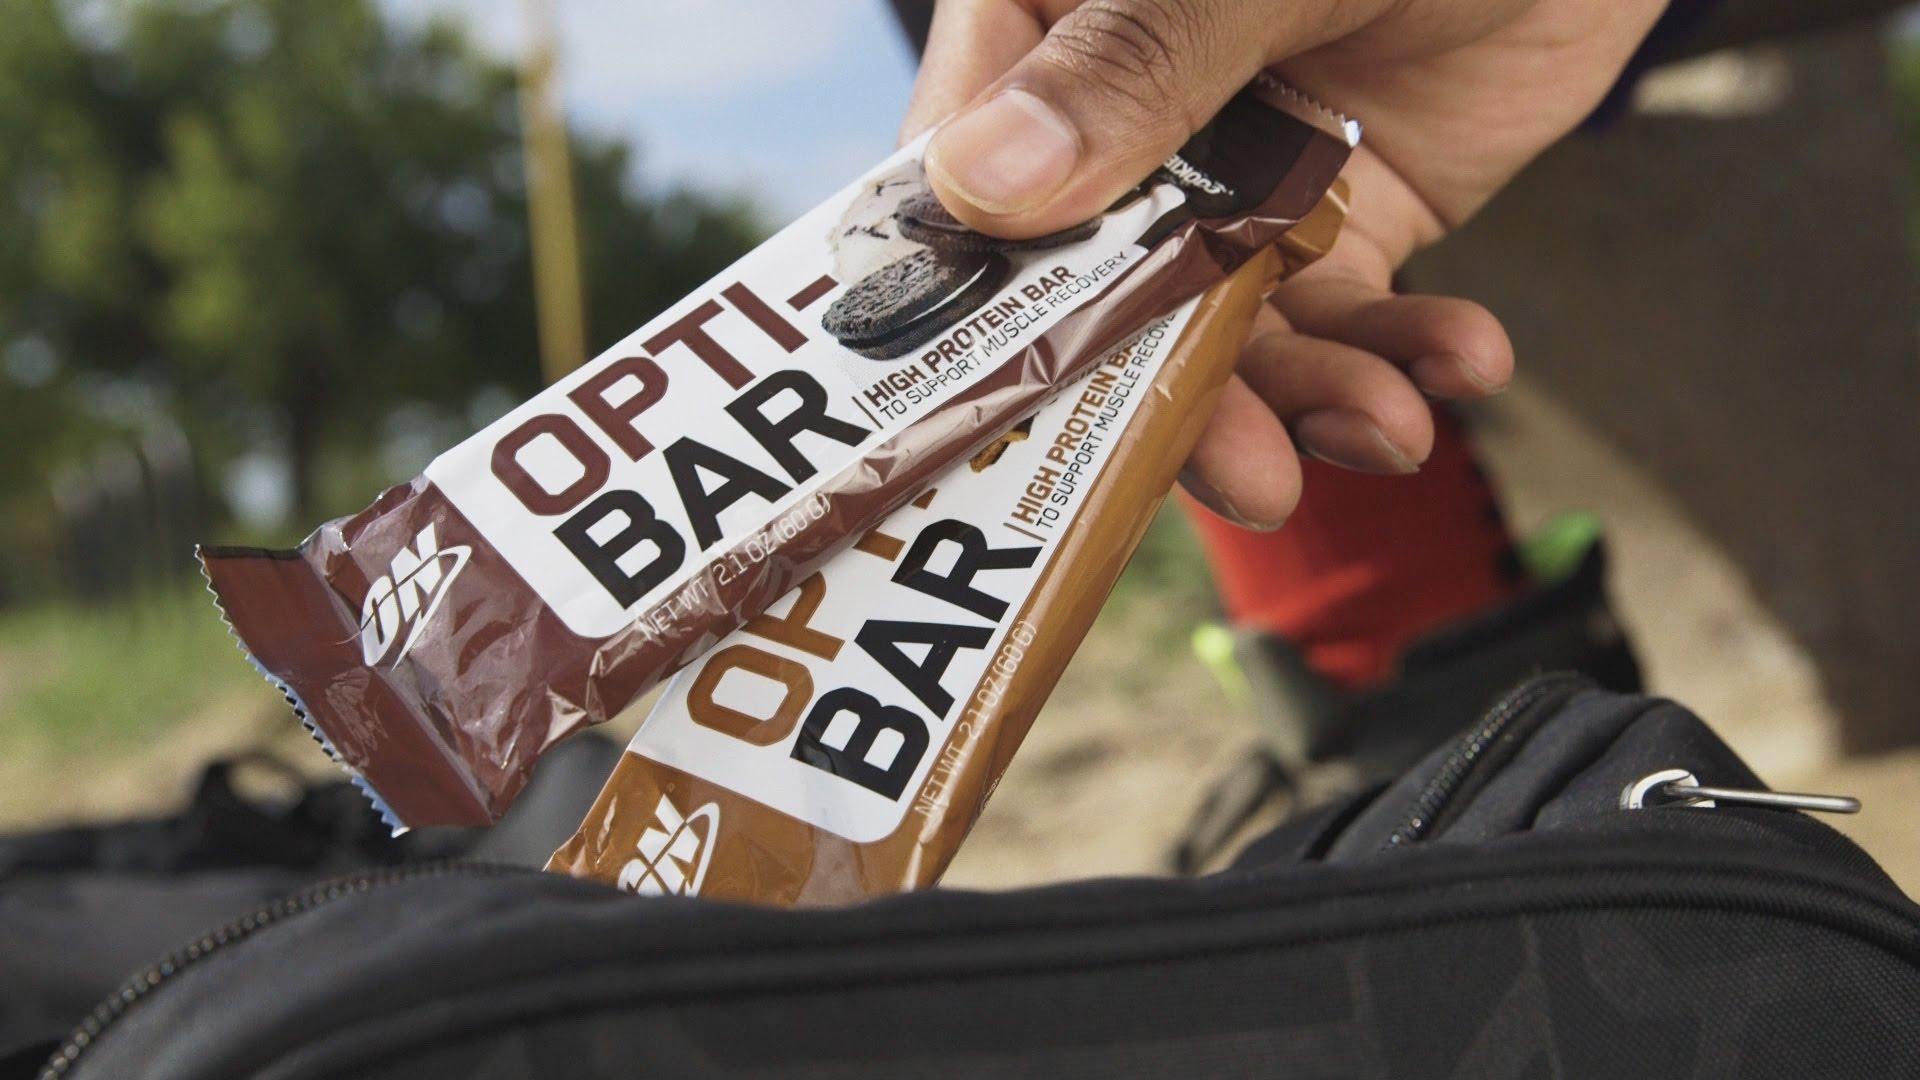 71914762c OPTI-BAR - Optimum Nutrition - BodySaver Suplementos - BodySaver ...